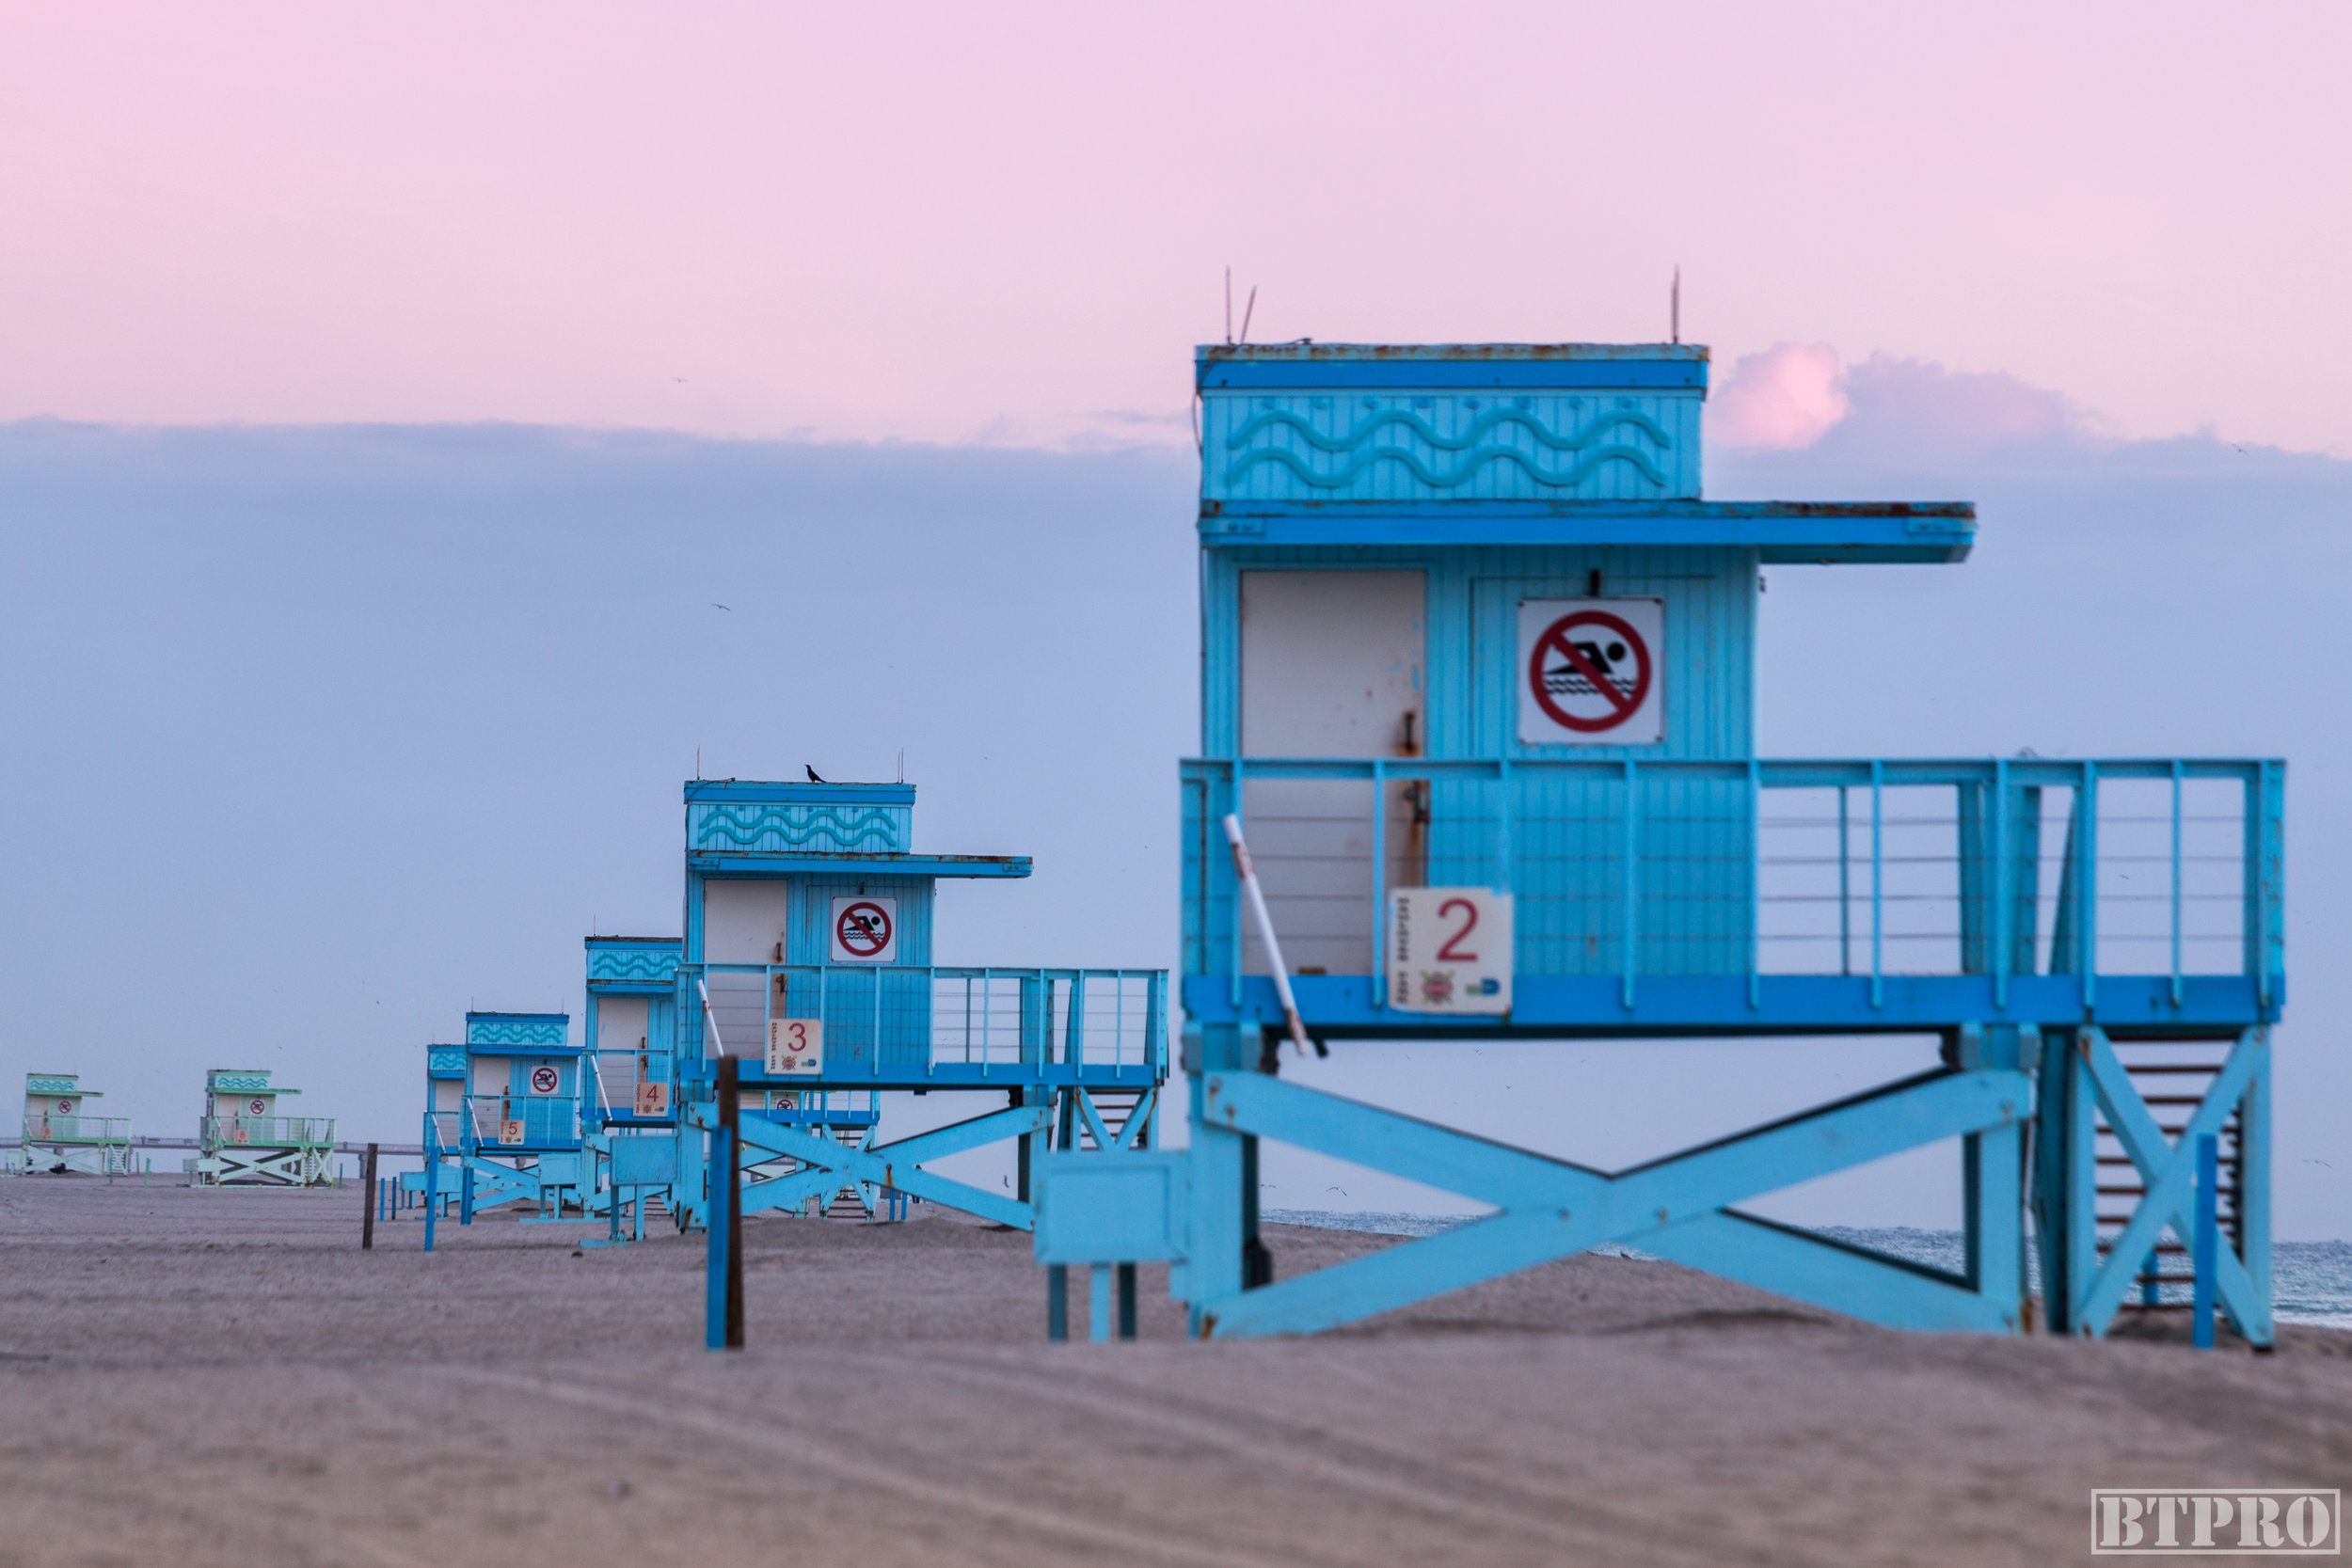 miami, miami beach, lifeguard tower, sunrise, sunrise photography, miami photographers